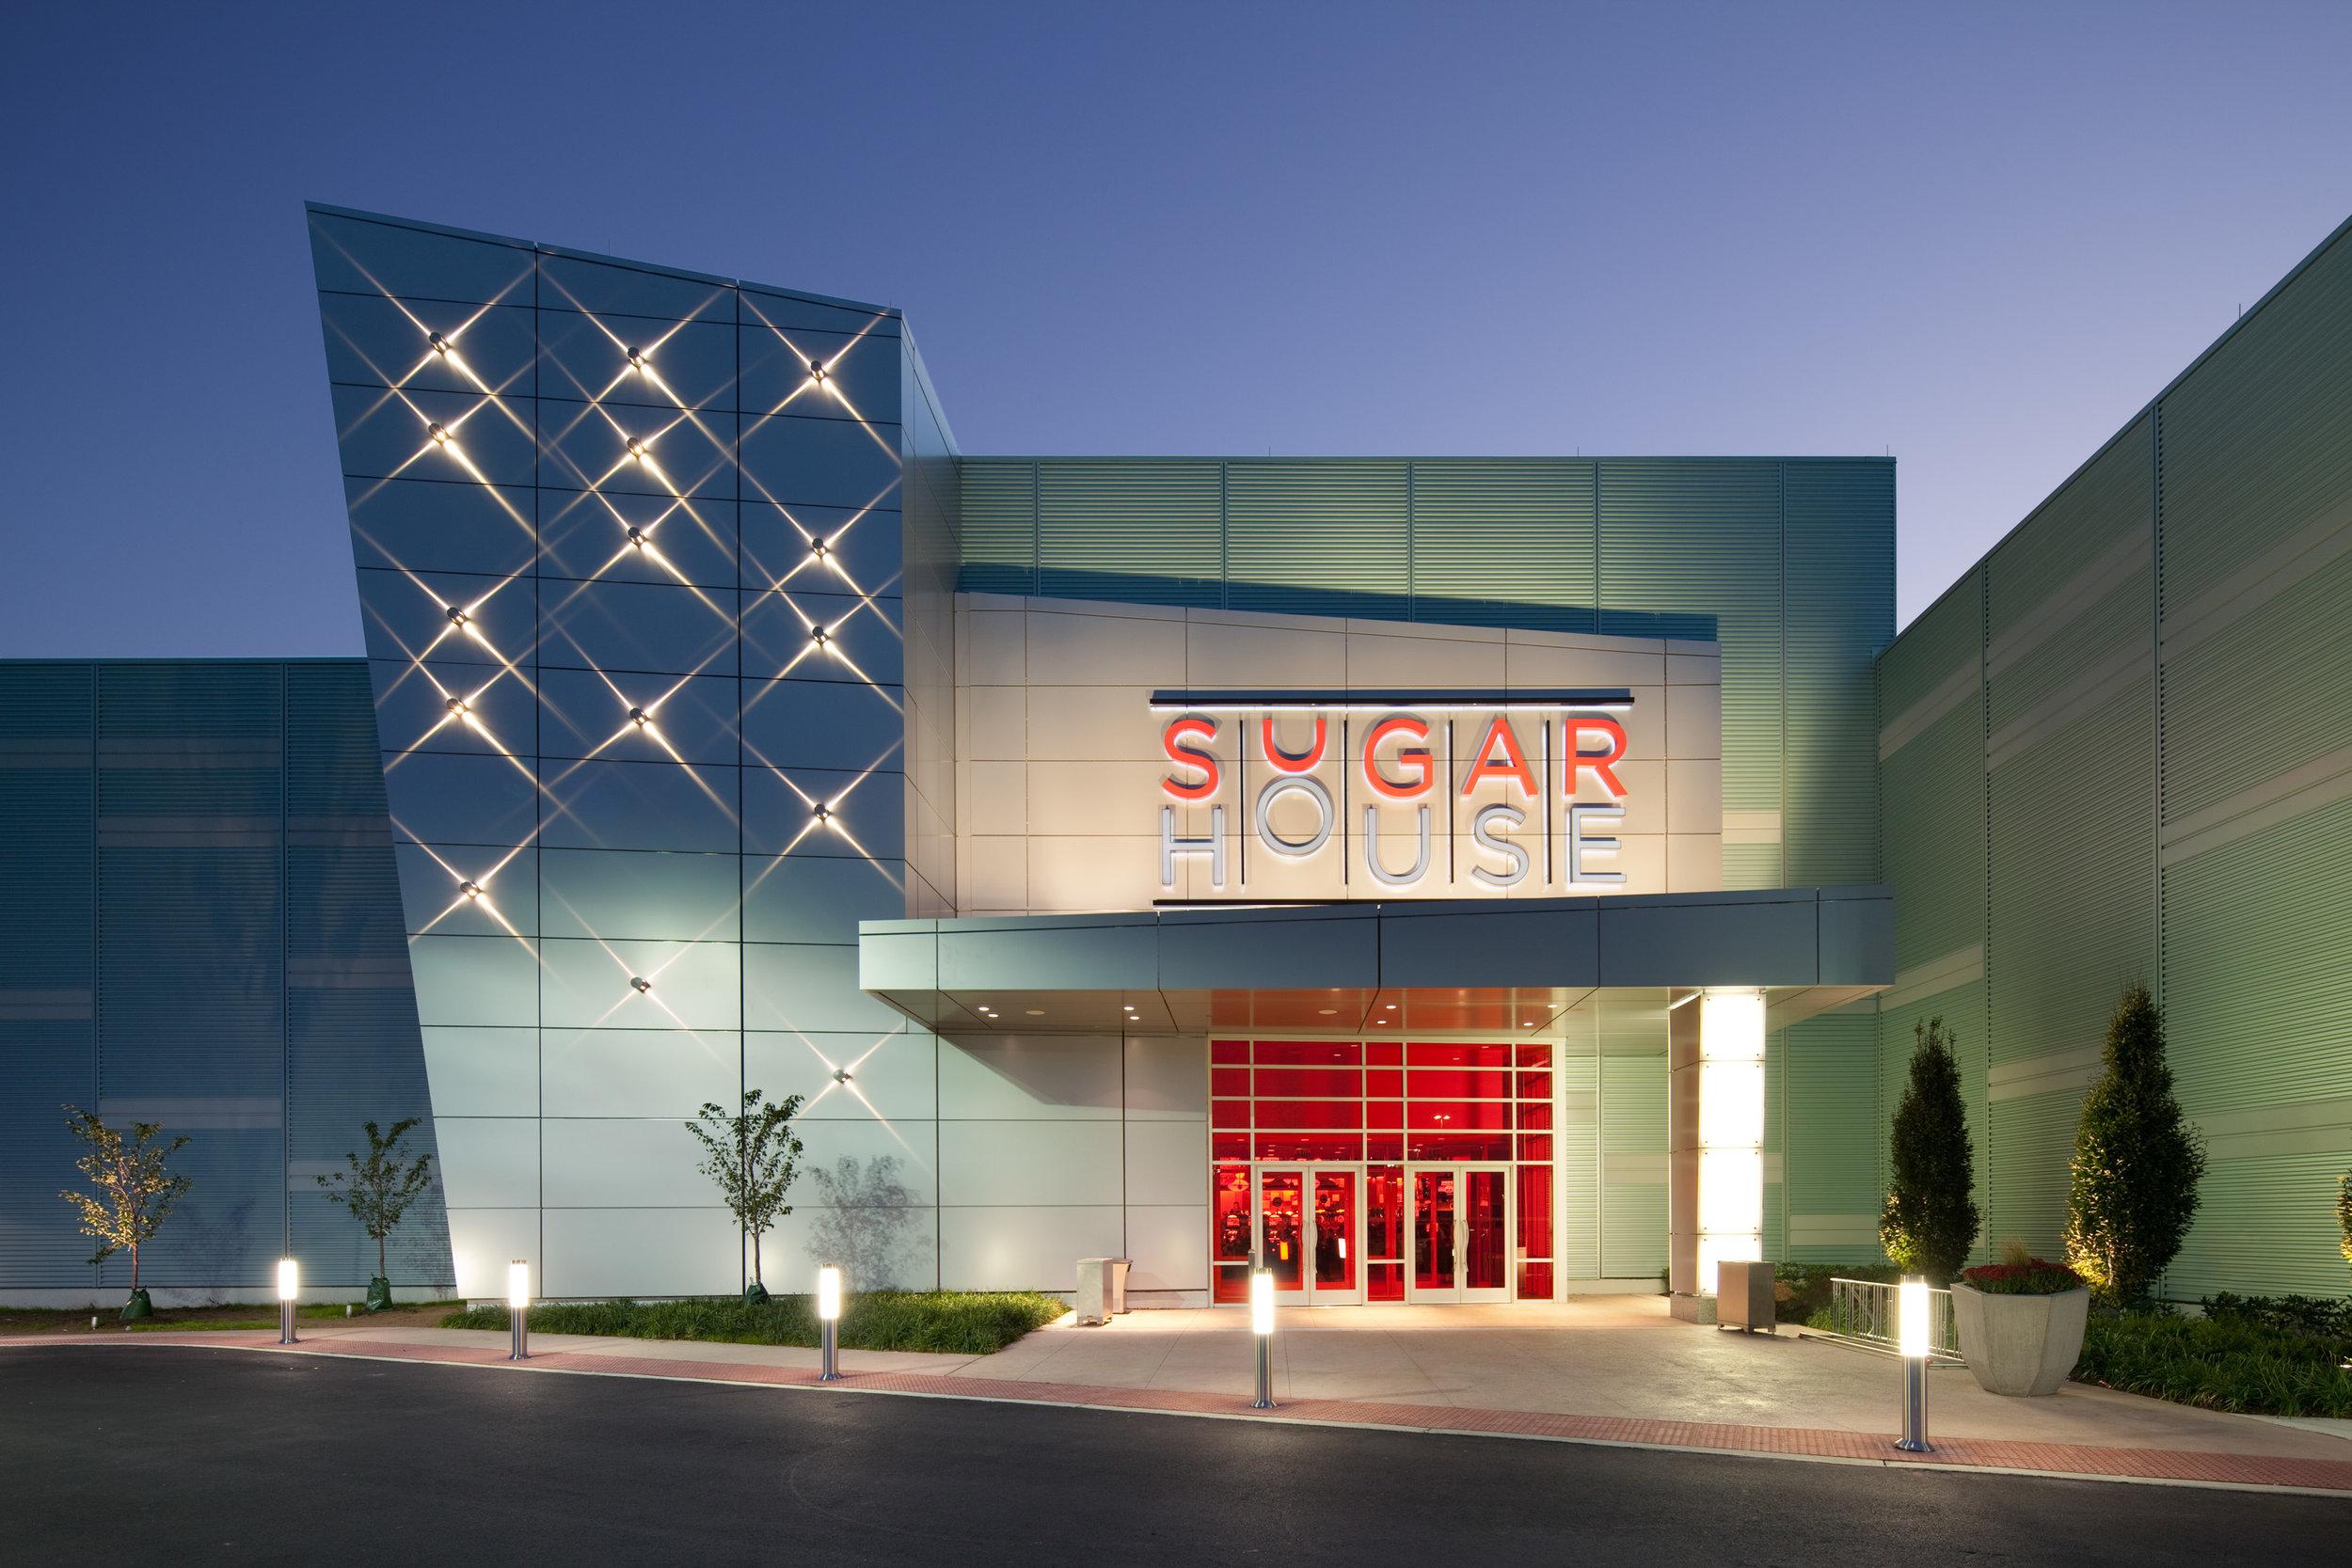 Portal to Sugar House Casino.